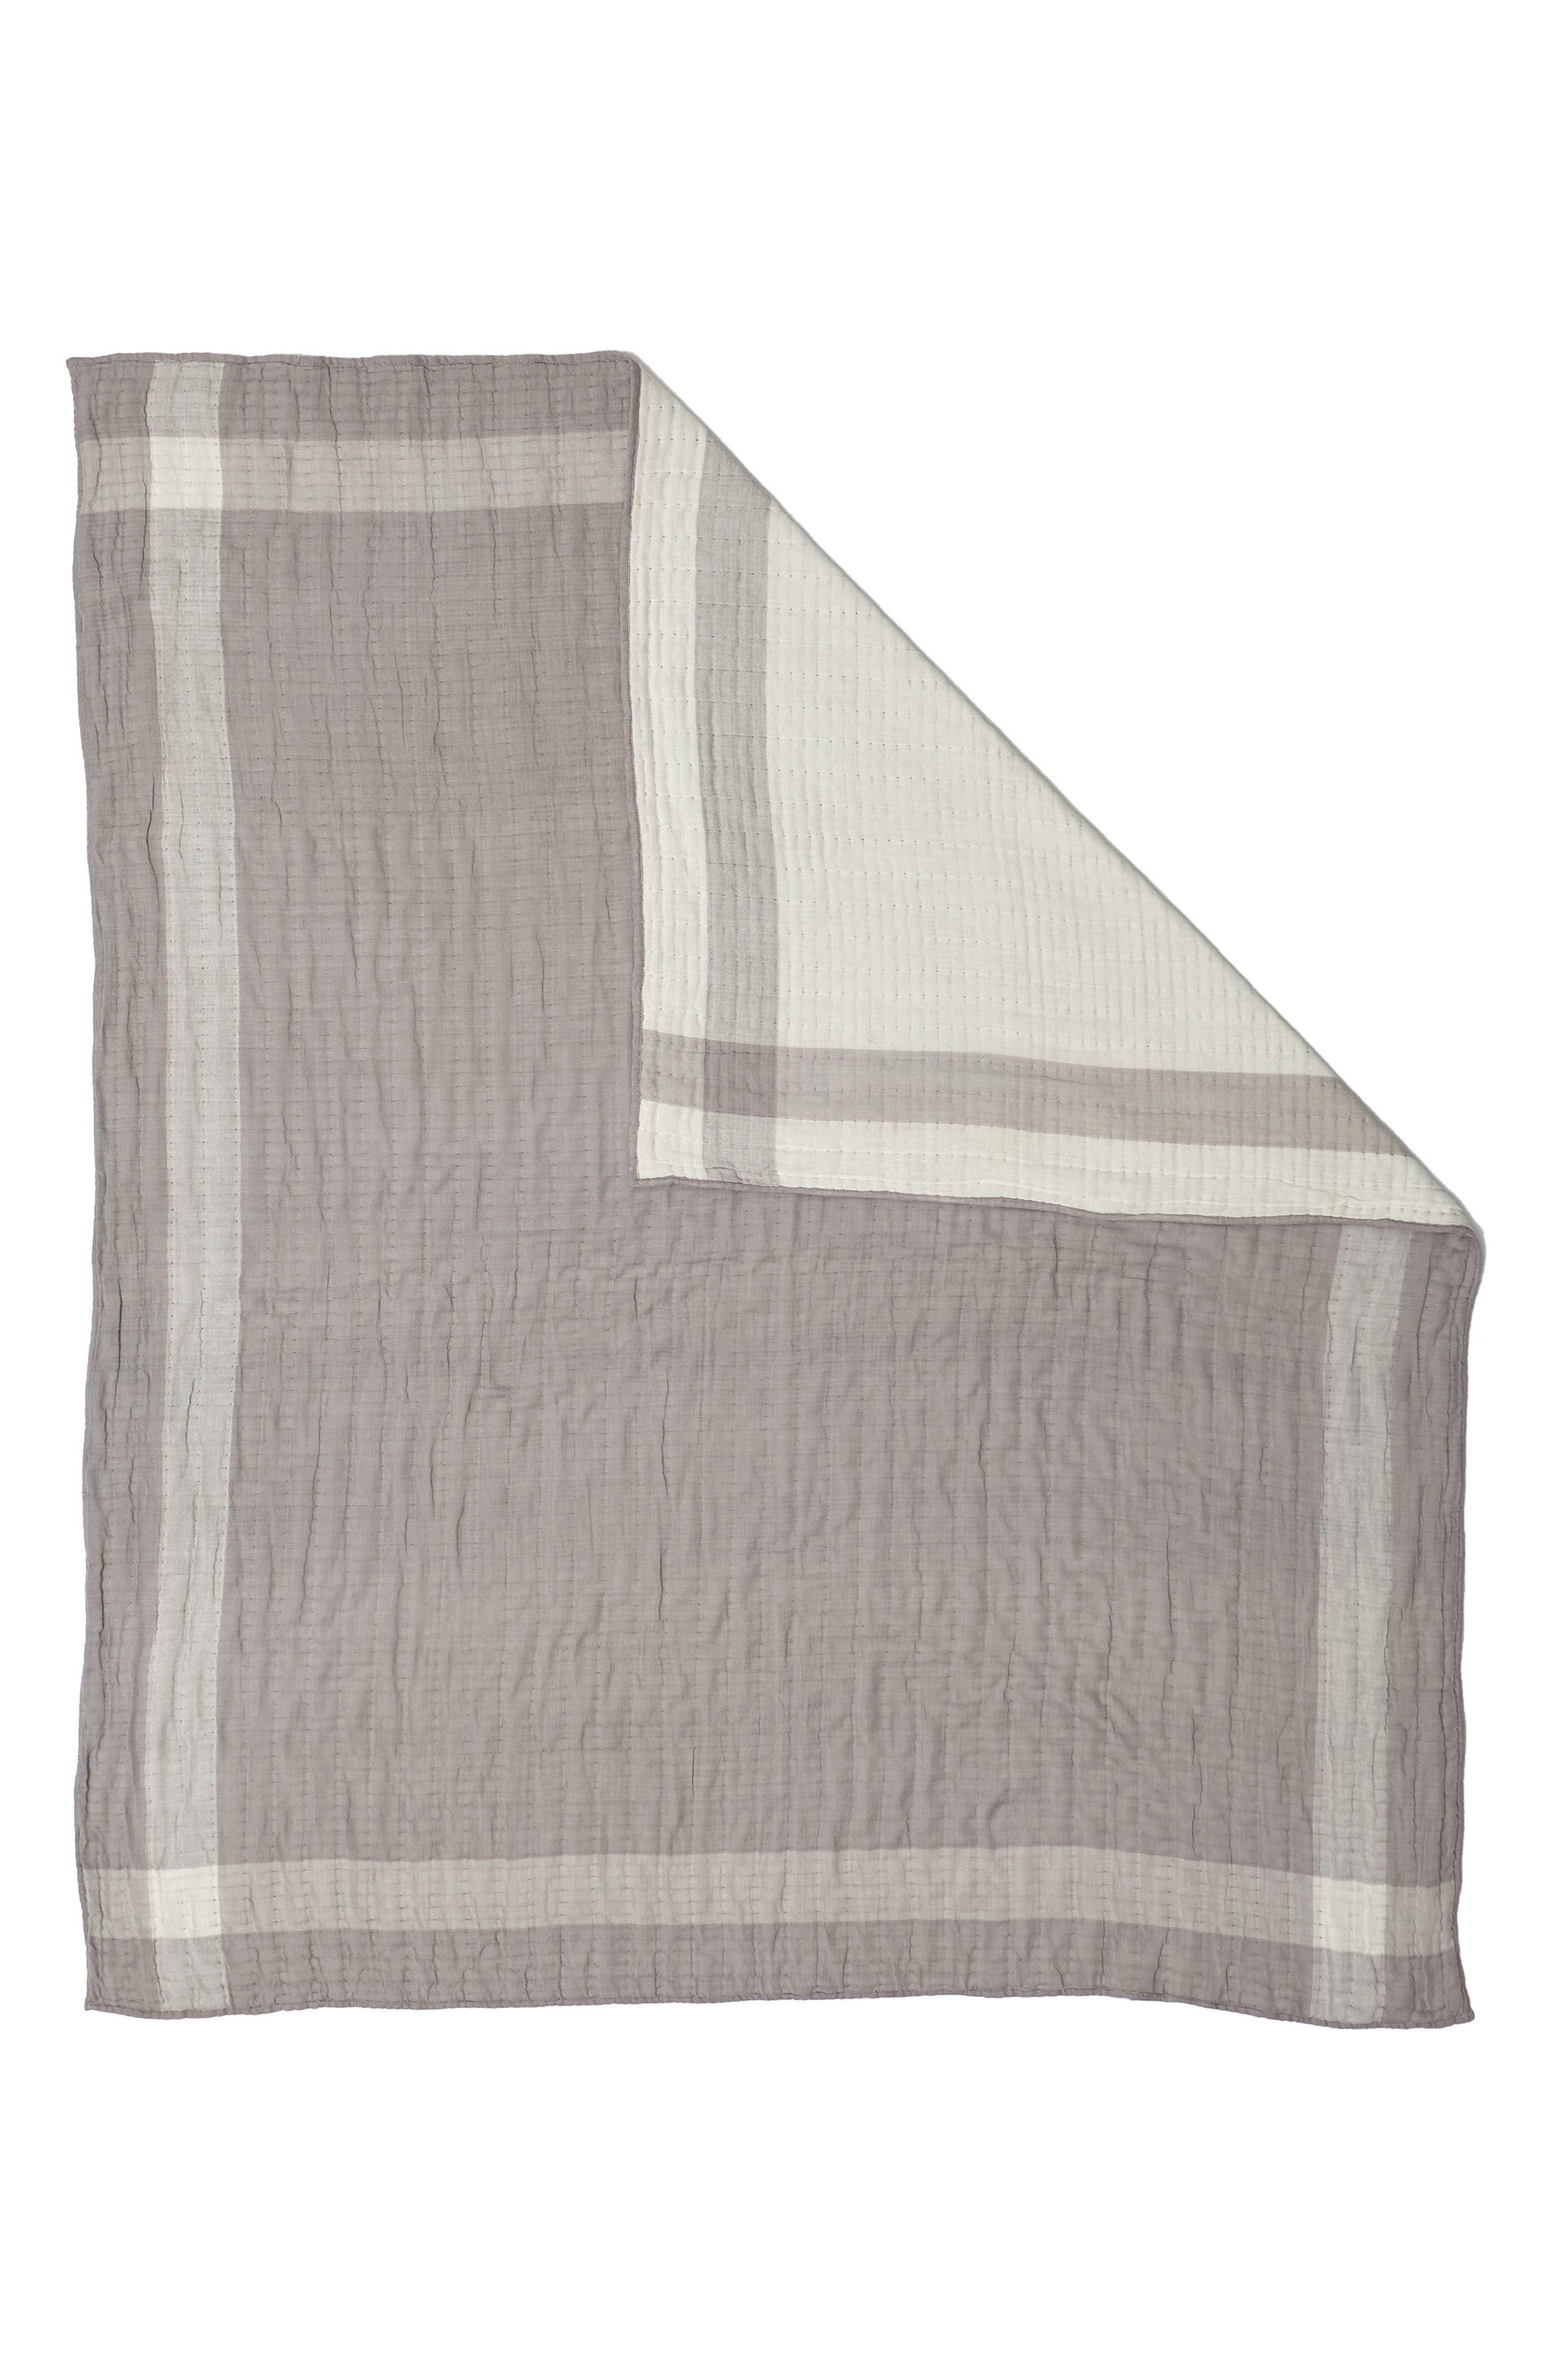 Sidekick Blanket,                         Main,                         color, Grey